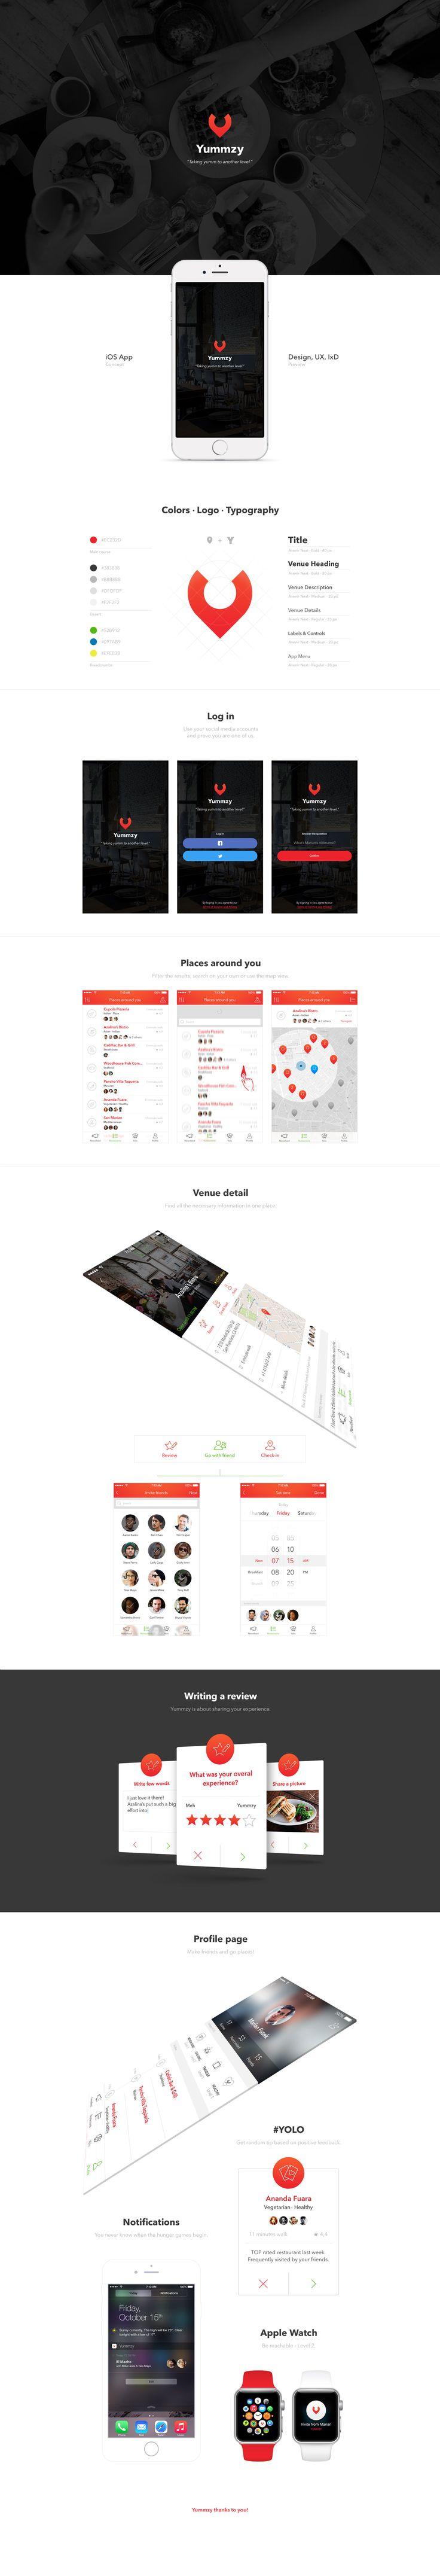 Mobile App Presentation by Marian Fusek - UX/UI Designer @ STRV